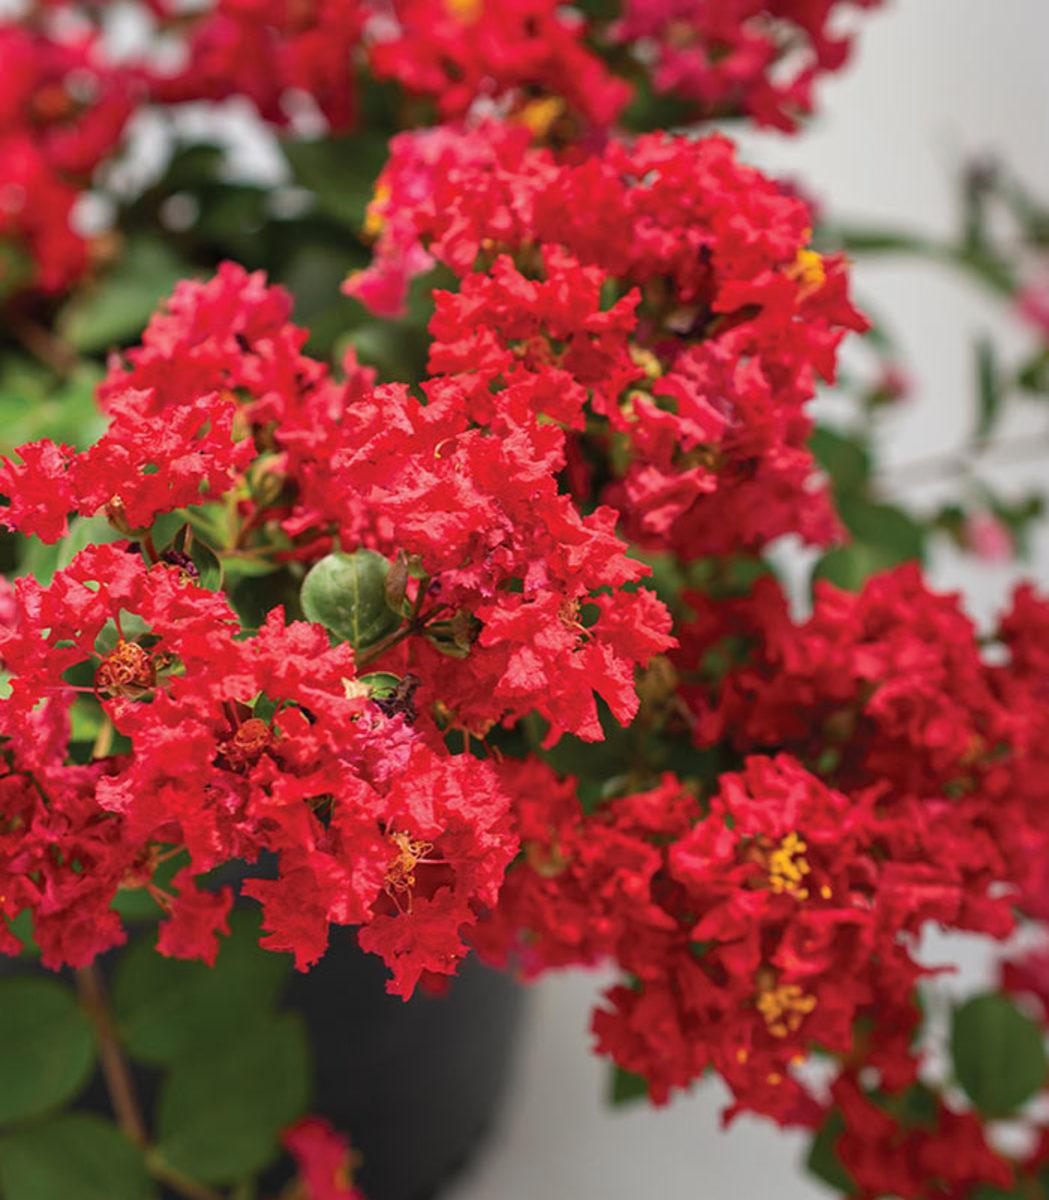 Bellini Strawberry has crimson flowers.